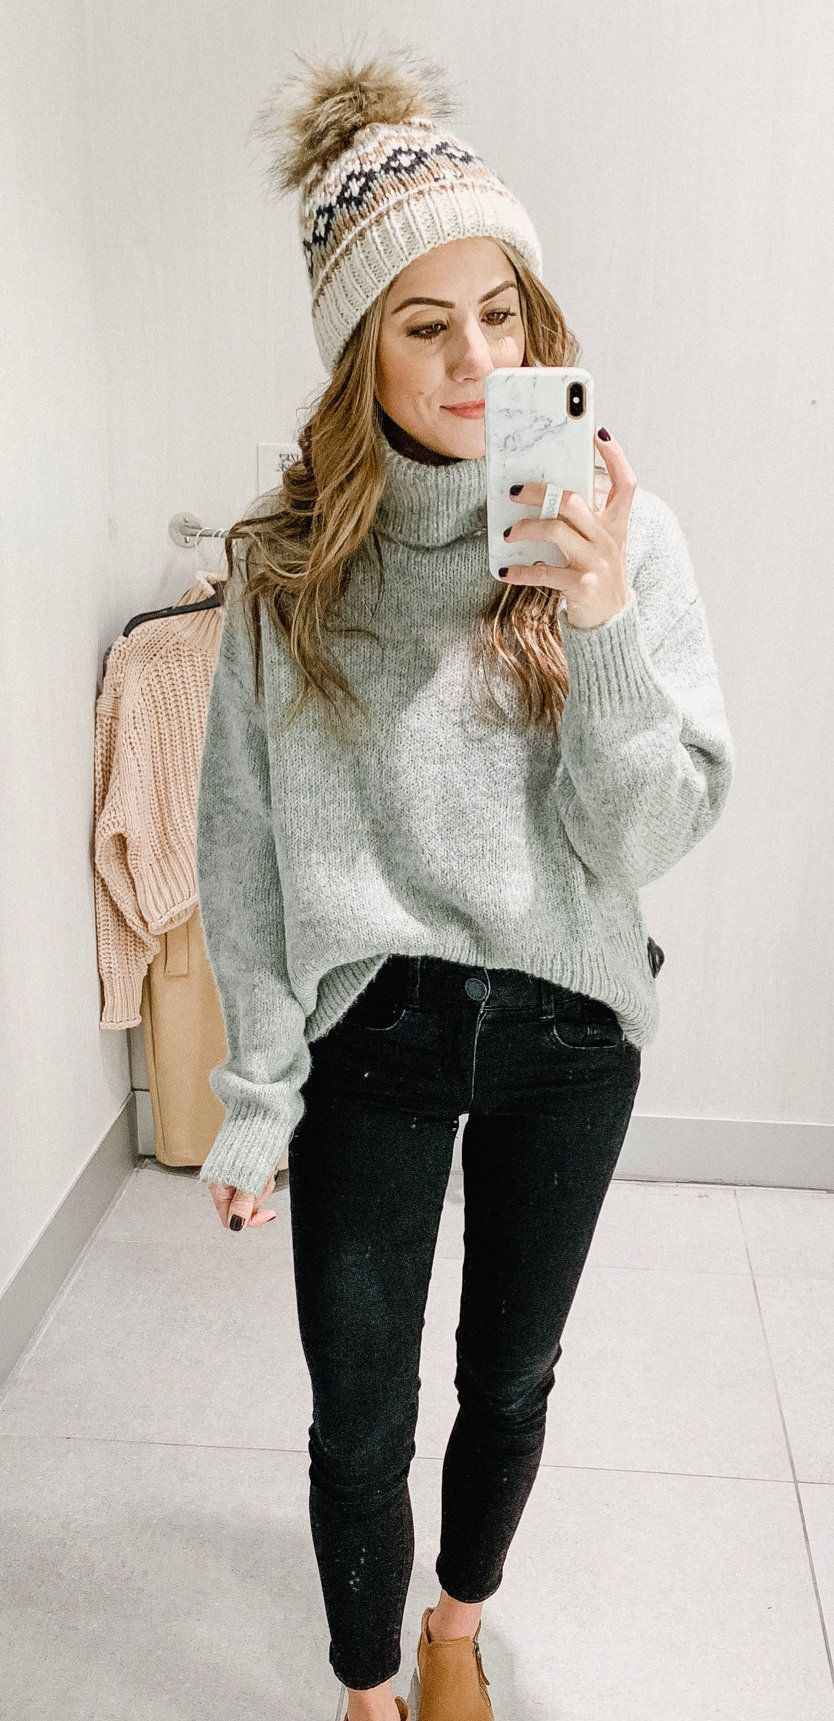 gray turtle-neck sweatshirt and black denim jeans